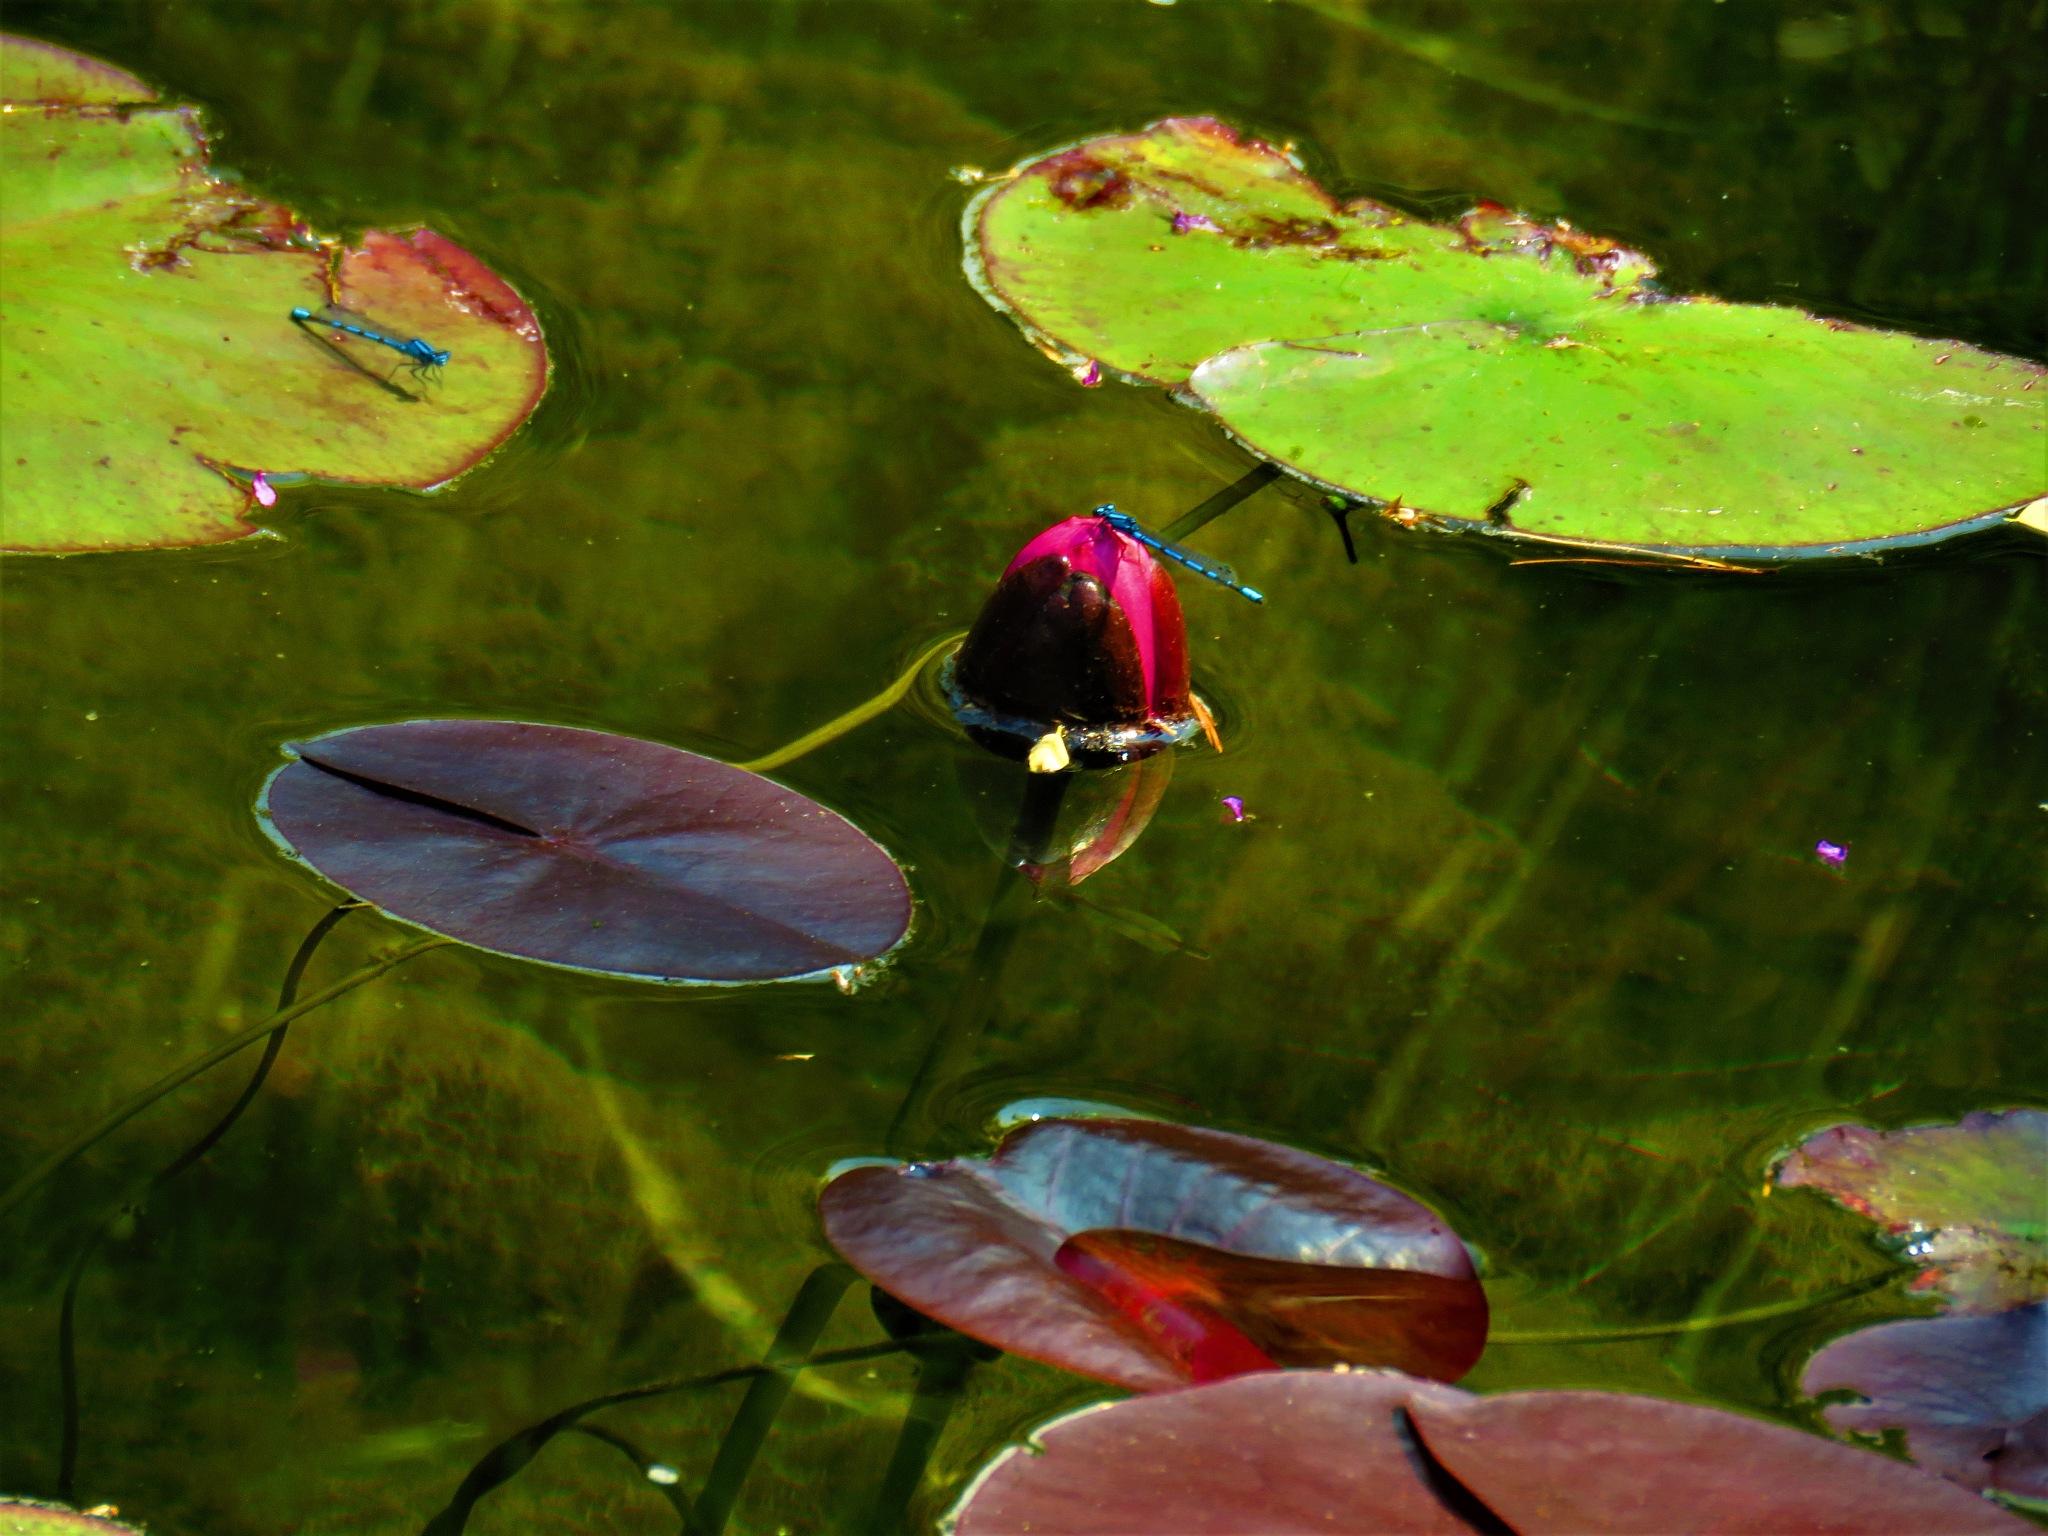 Waterlelieknop met juffers by Marianne Krijgsman